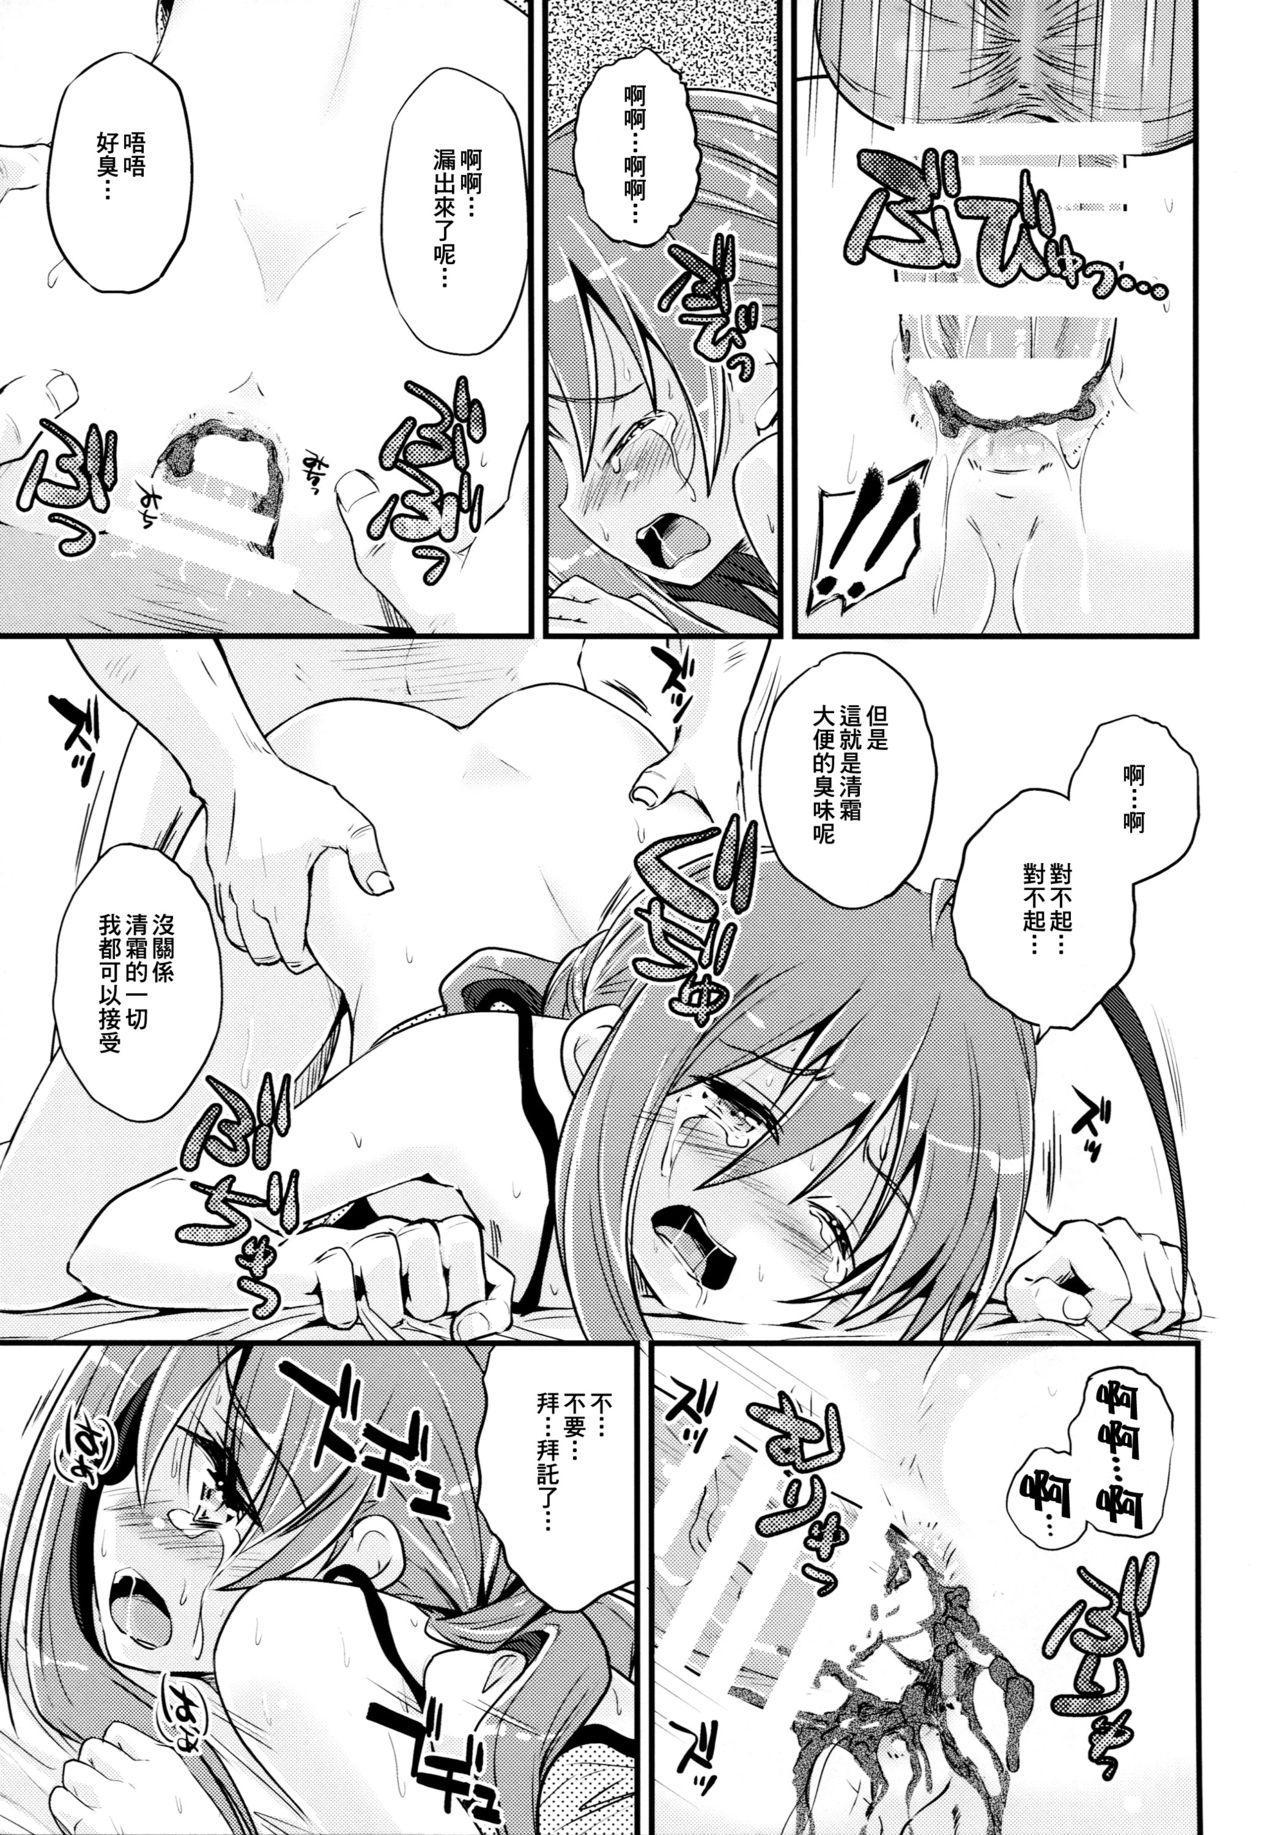 KanColle Haisetsu Sex Goudoushi LoveSca! Goudou Enshuu!! | 艦C排泄性交合同誌 激情糞便! 聯合演習!! 26